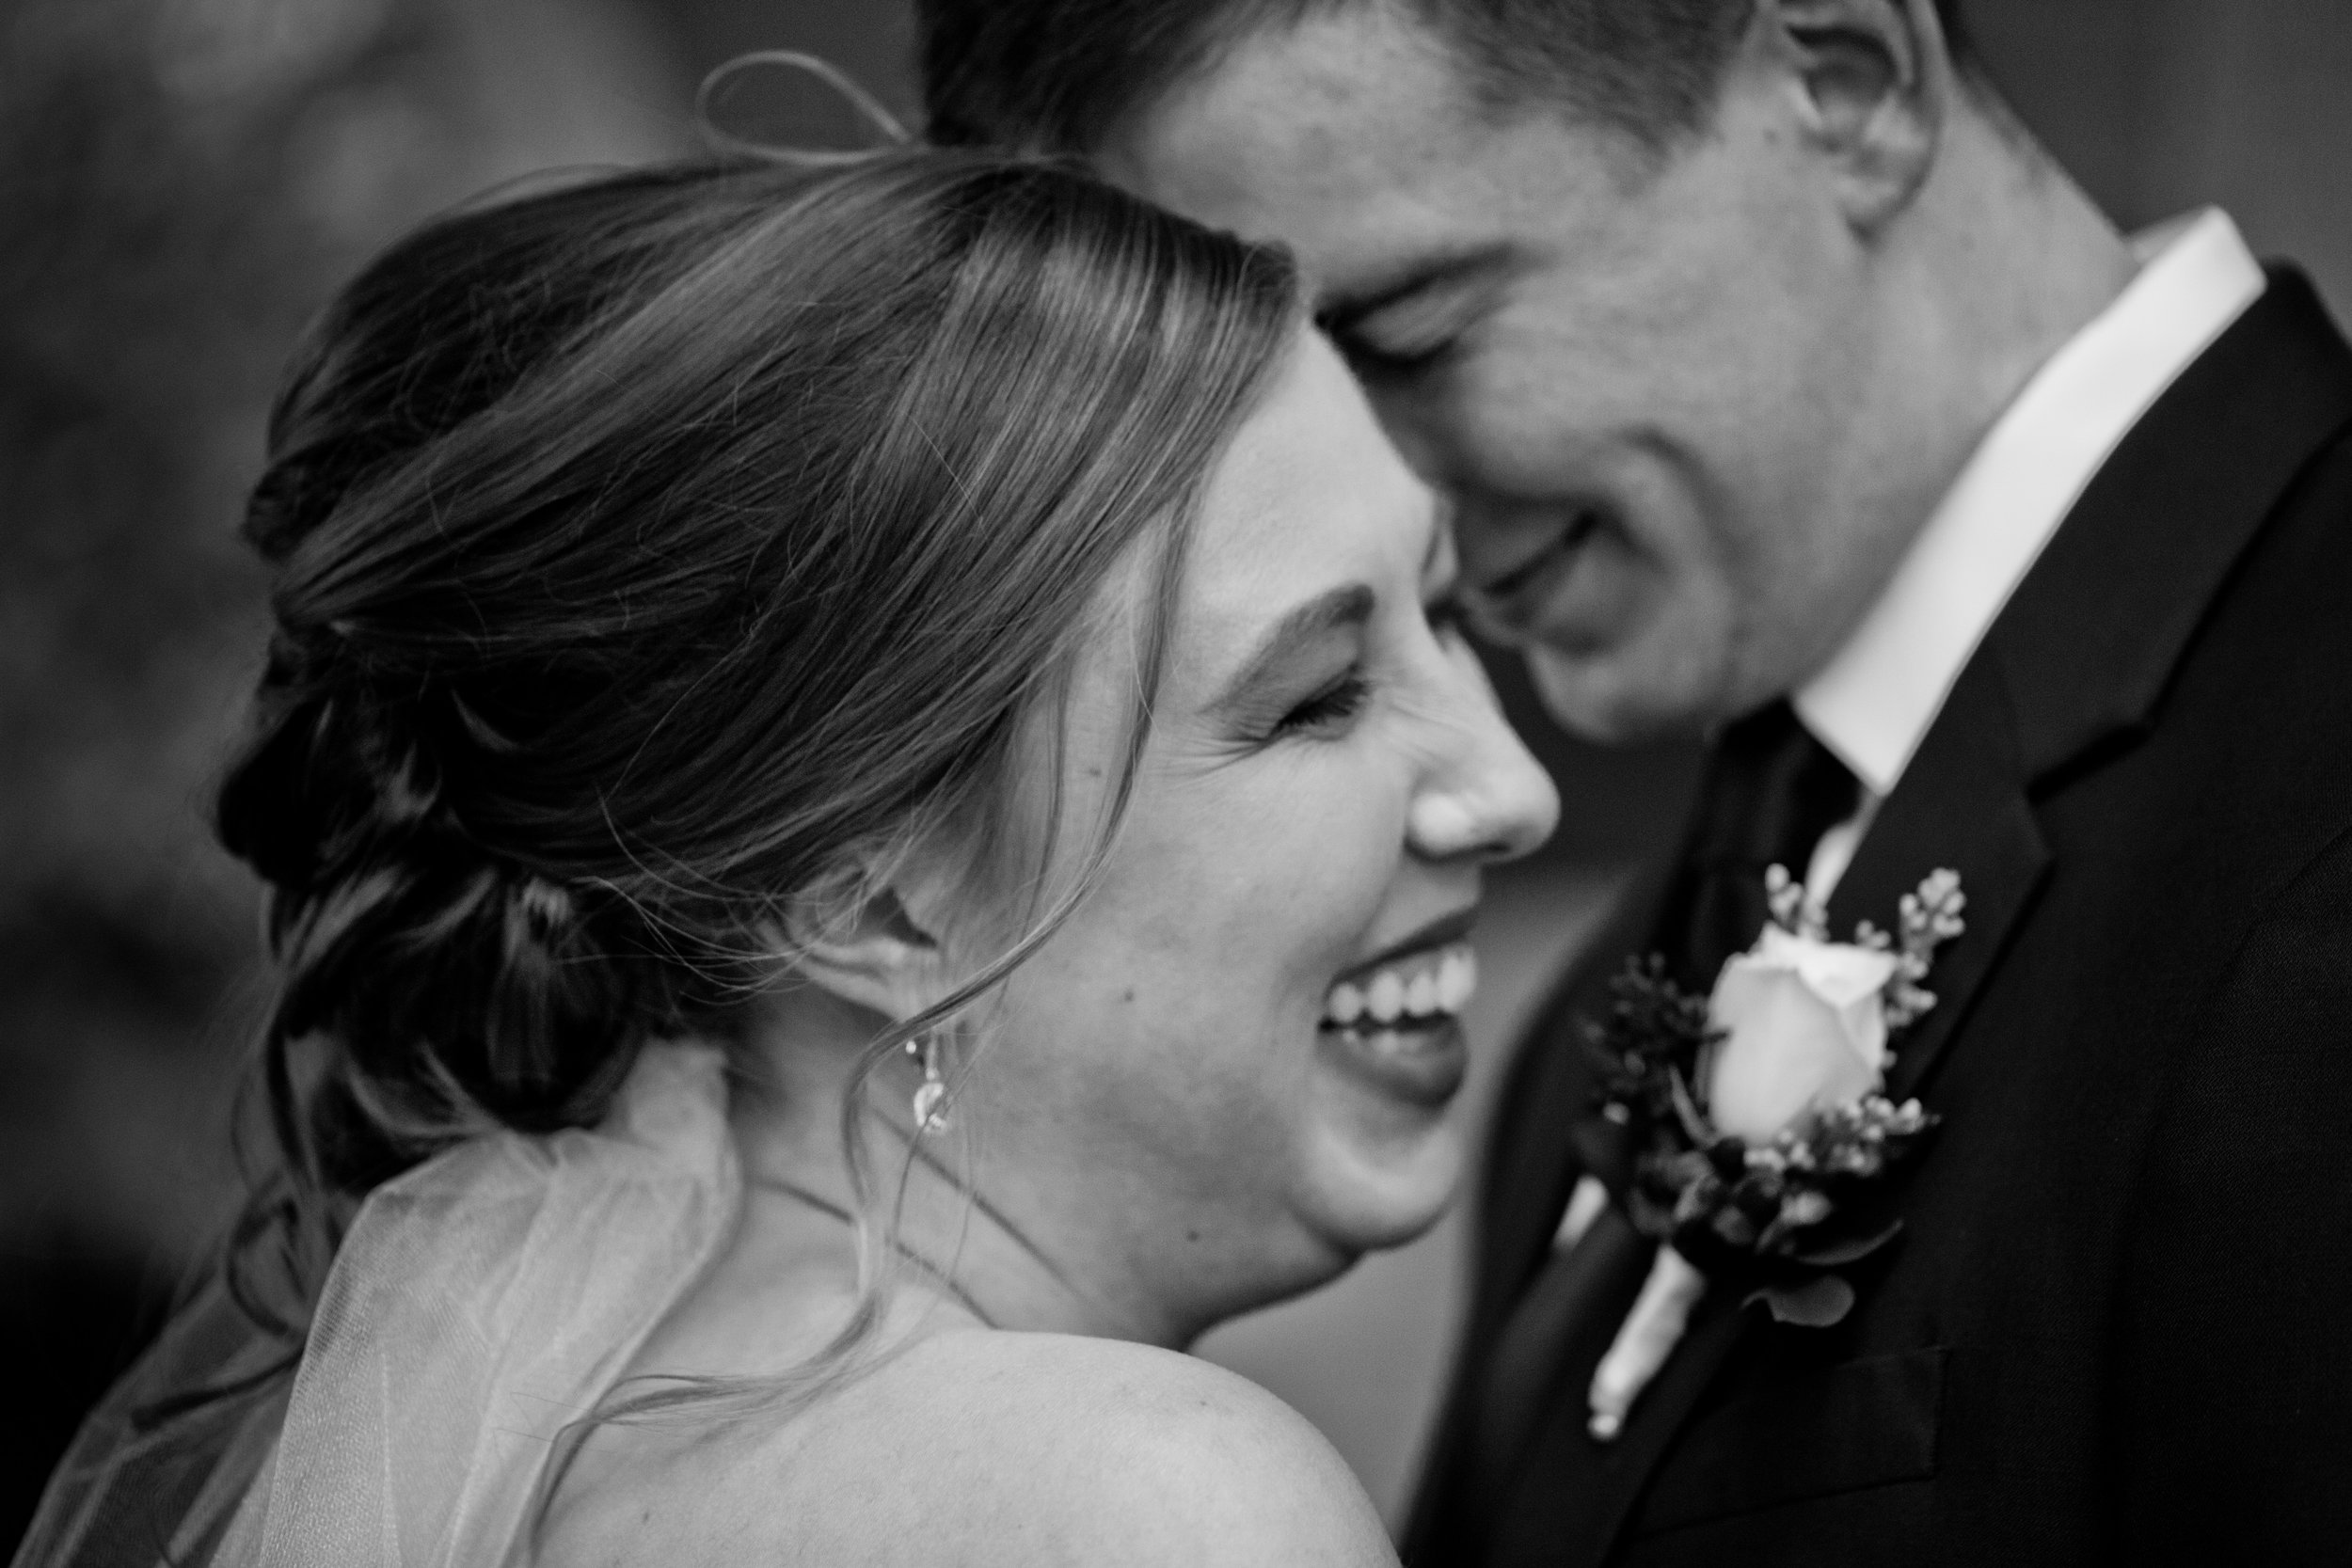 Kenzie-Nick-des-moines-wedding-photographer-118.jpg